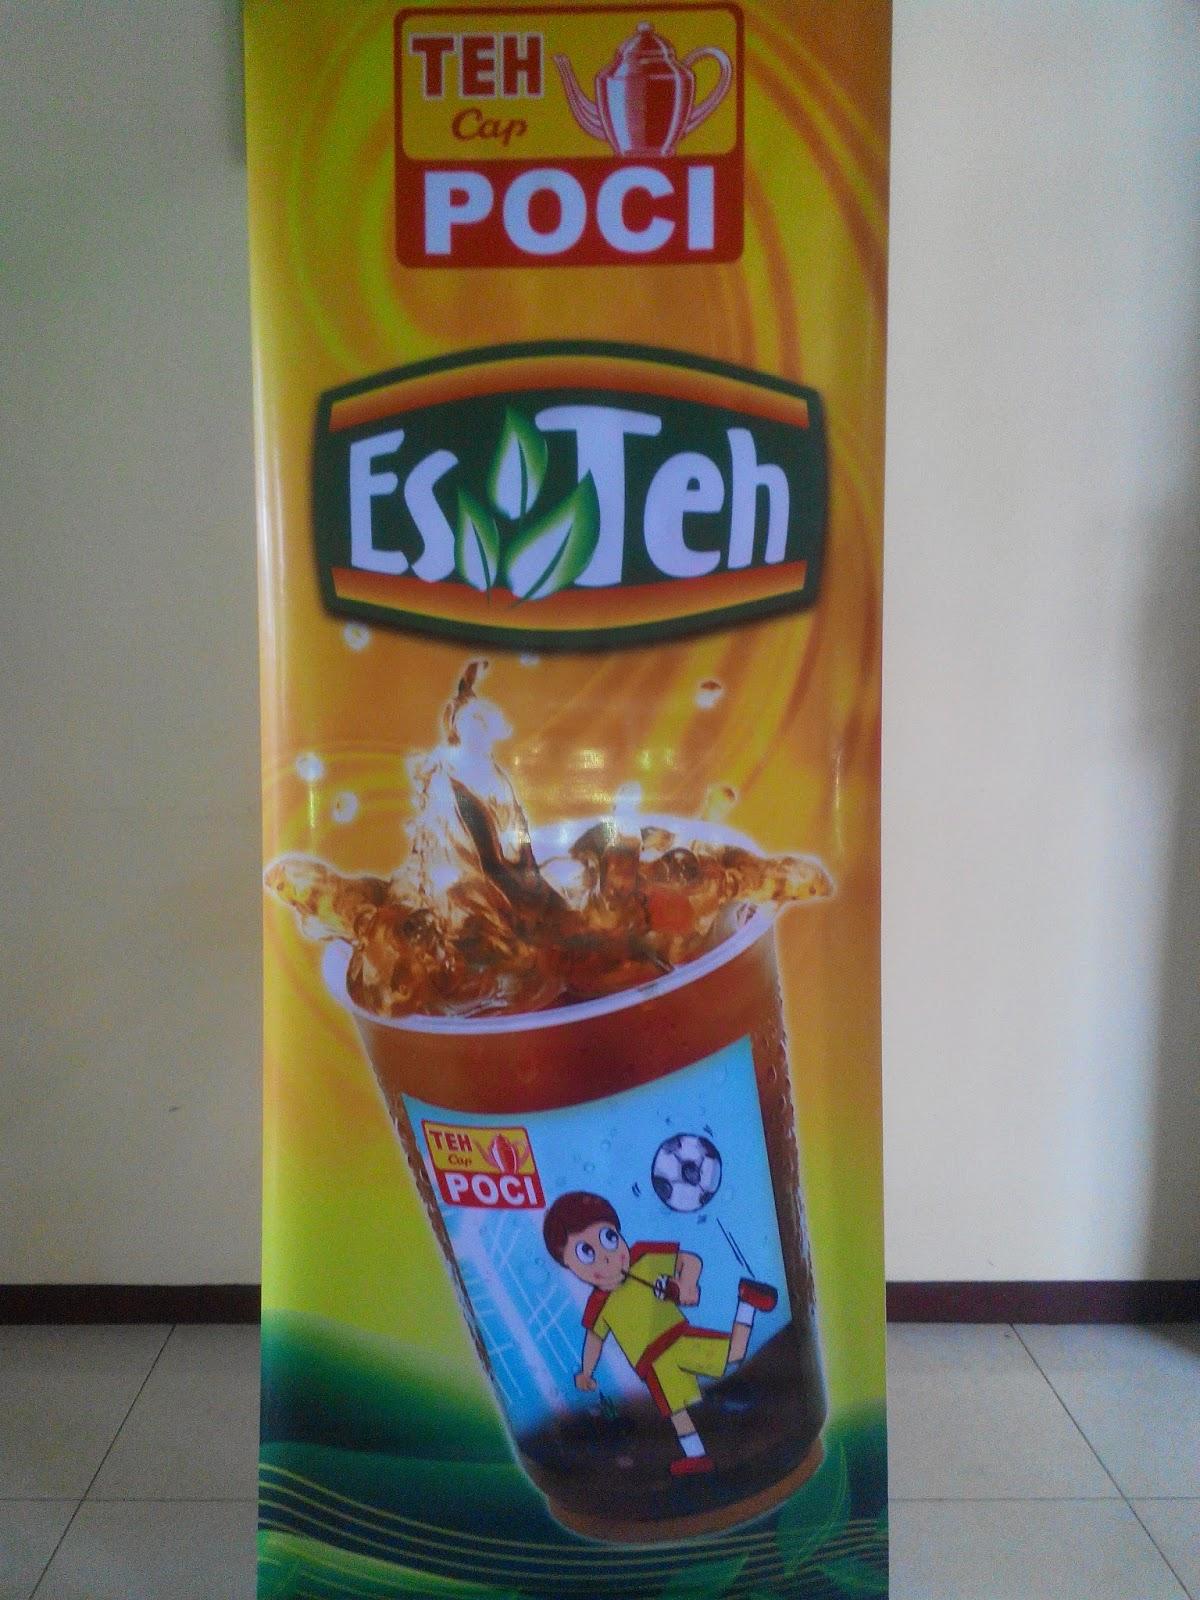 Teh Poci